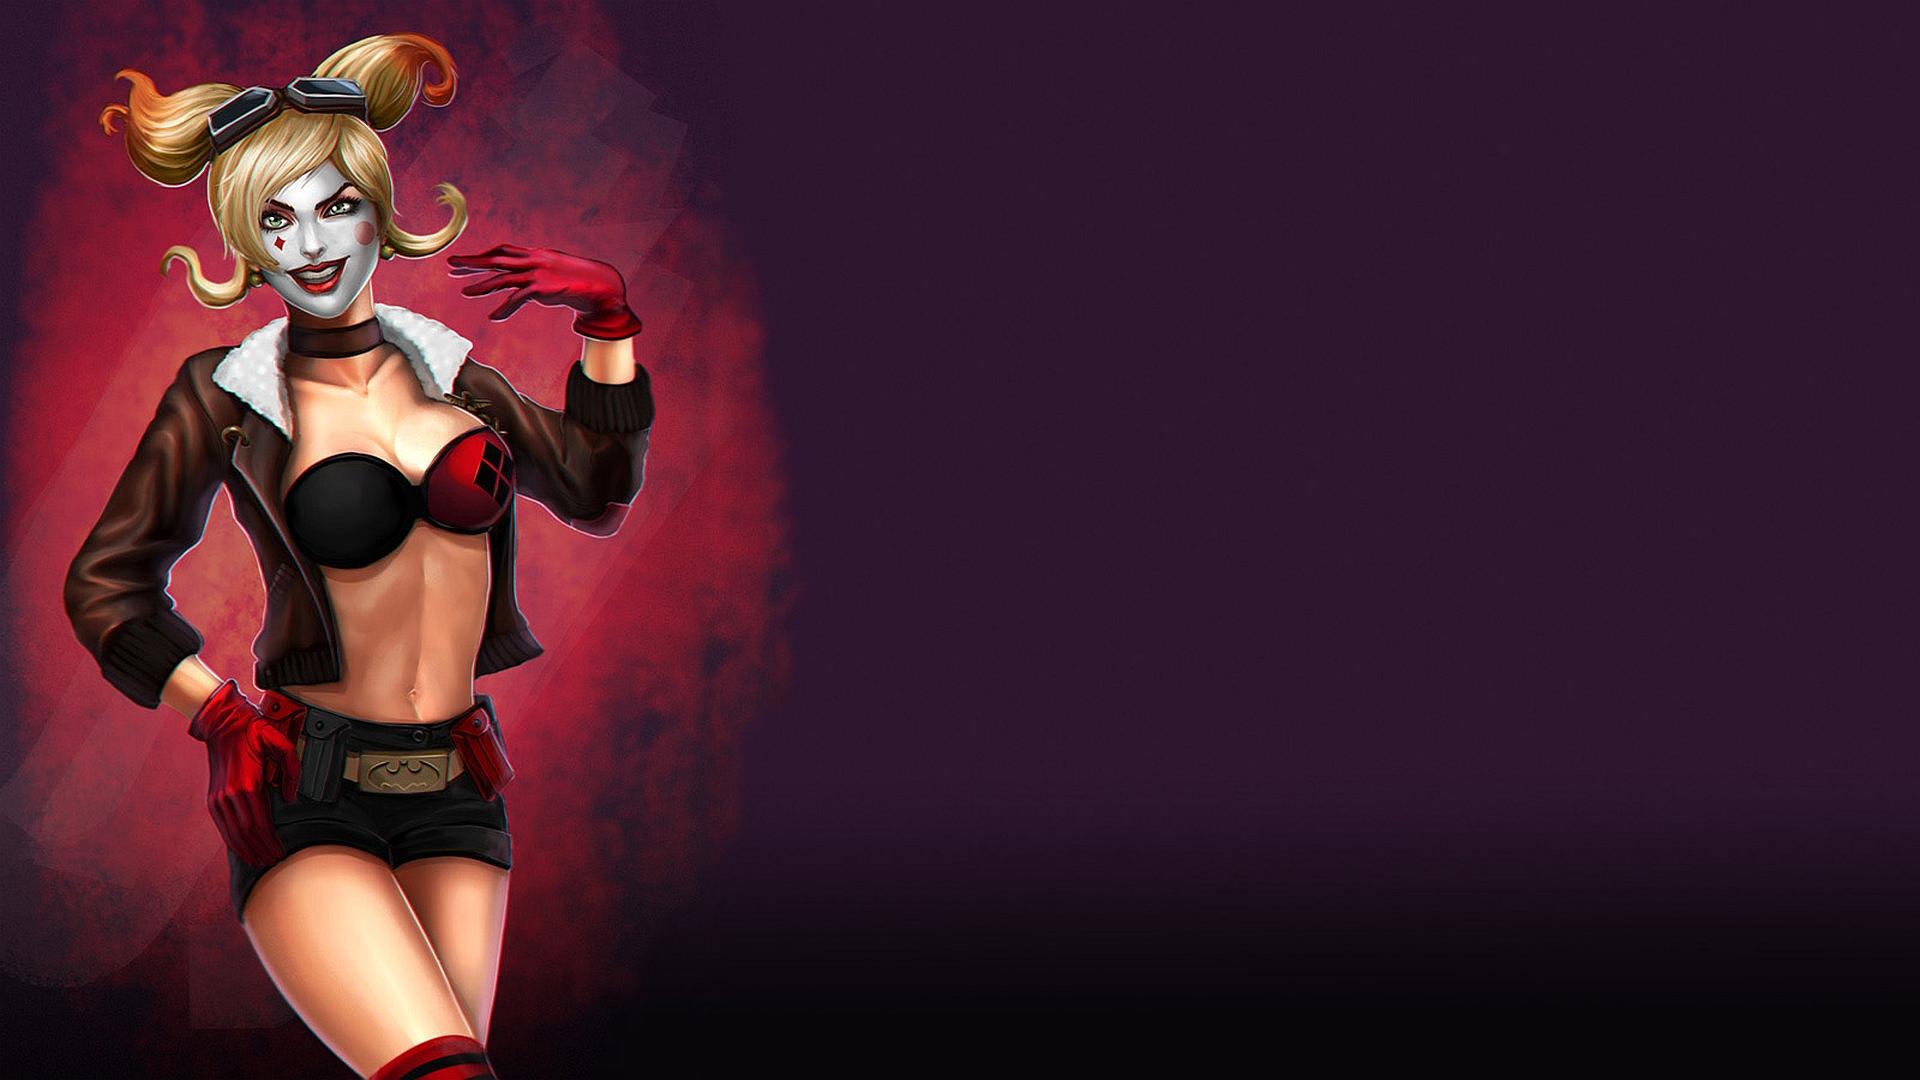 Simple Wallpaper Movie Harley Quinn - harley-quinn-wallpapers-HD9  Collection_419387.jpg